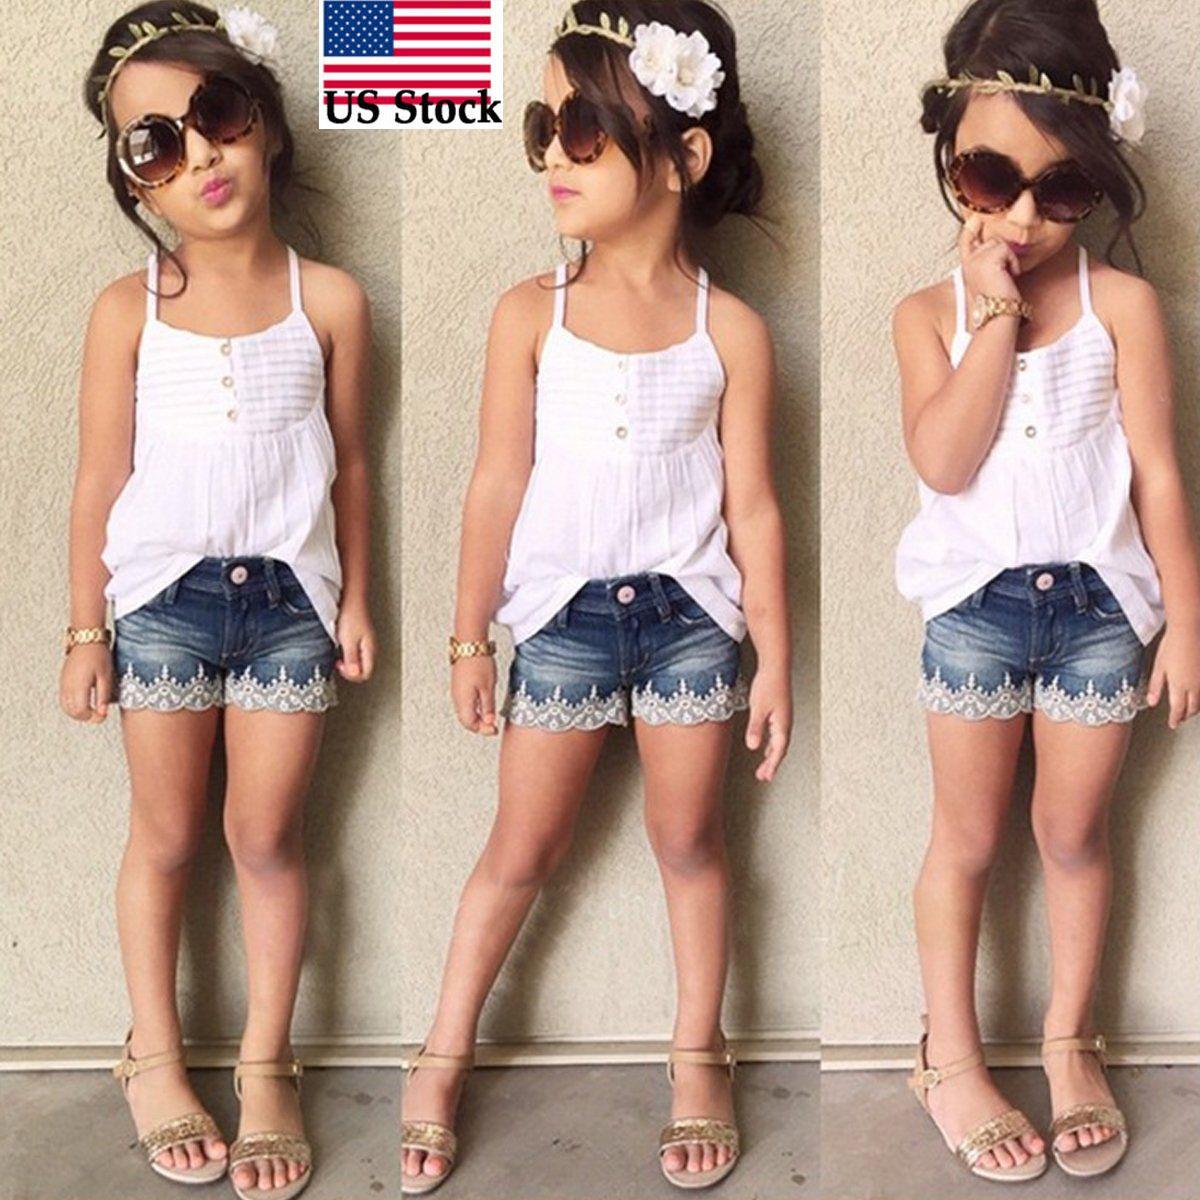 5d675759e 2Pcs Kid Baby Girls Outfits Set Tank Top T-Shirt +Jeans Pants Clothes 2-7Y  Us